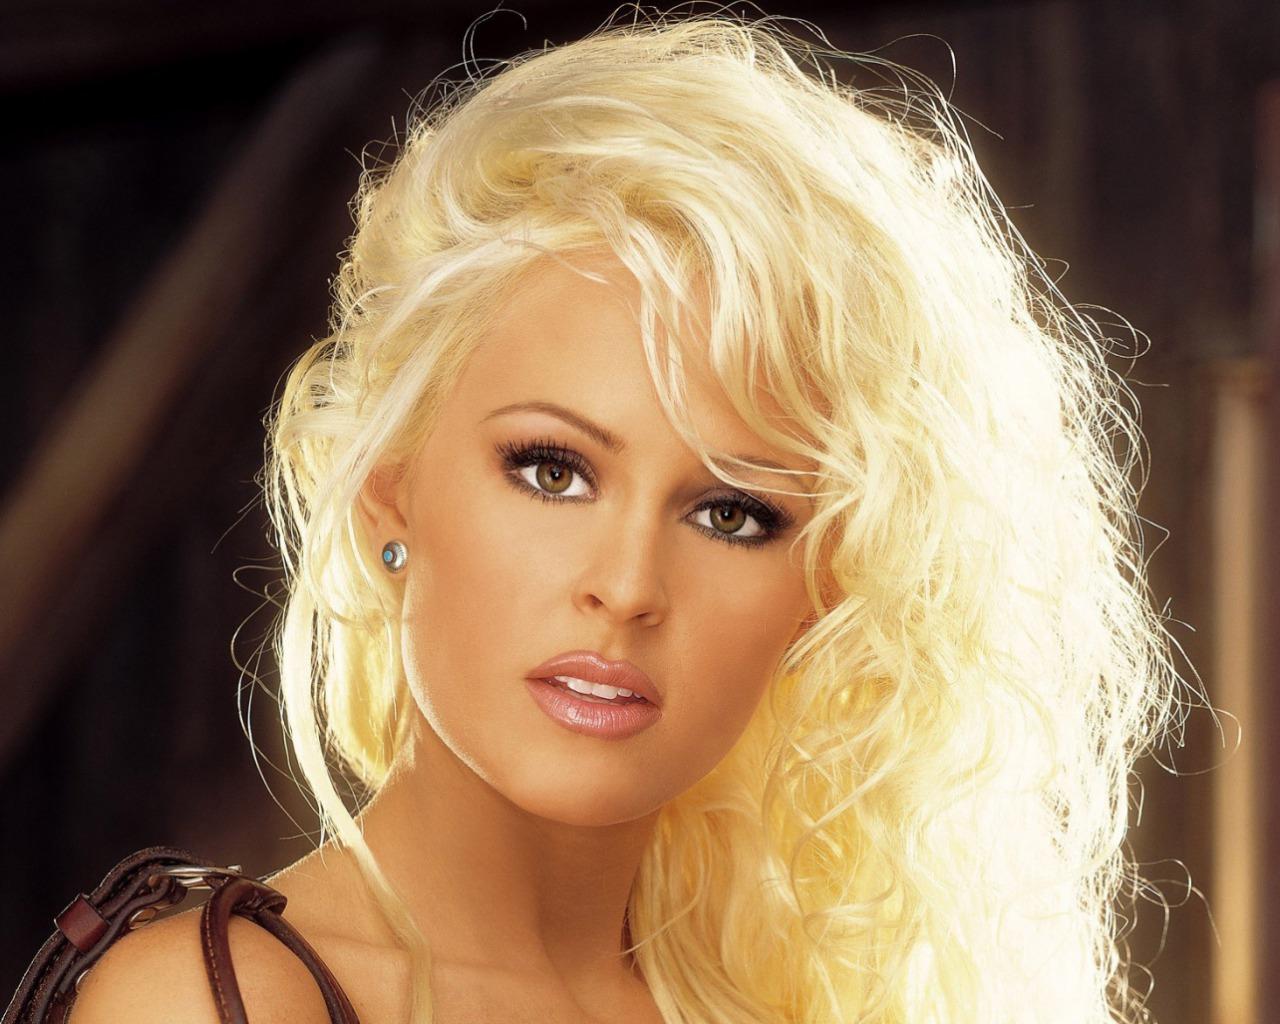 http://2.bp.blogspot.com/-hb_OsgnA-aE/UPlLDmSfdOI/AAAAAAAACZM/X_fFK_RbN6I/s1600/Celebrity+HD+HairStyle+Wallpapers+1.jpg